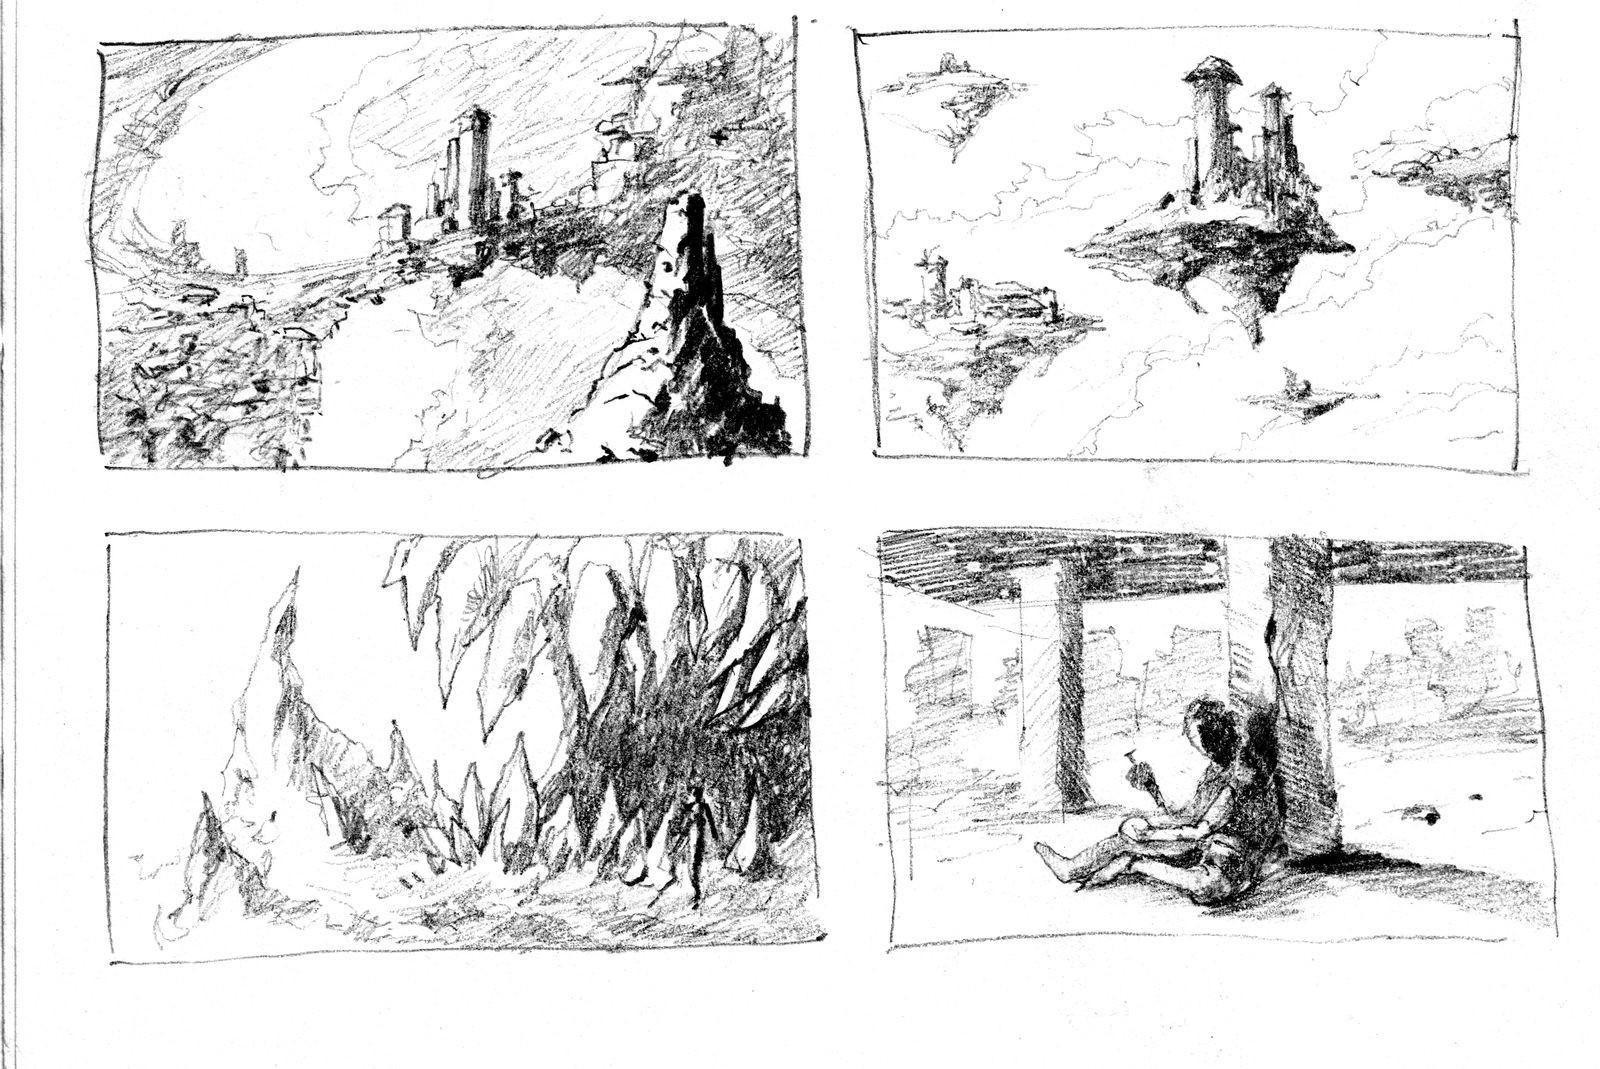 Stijn windig thumbnails 03 small